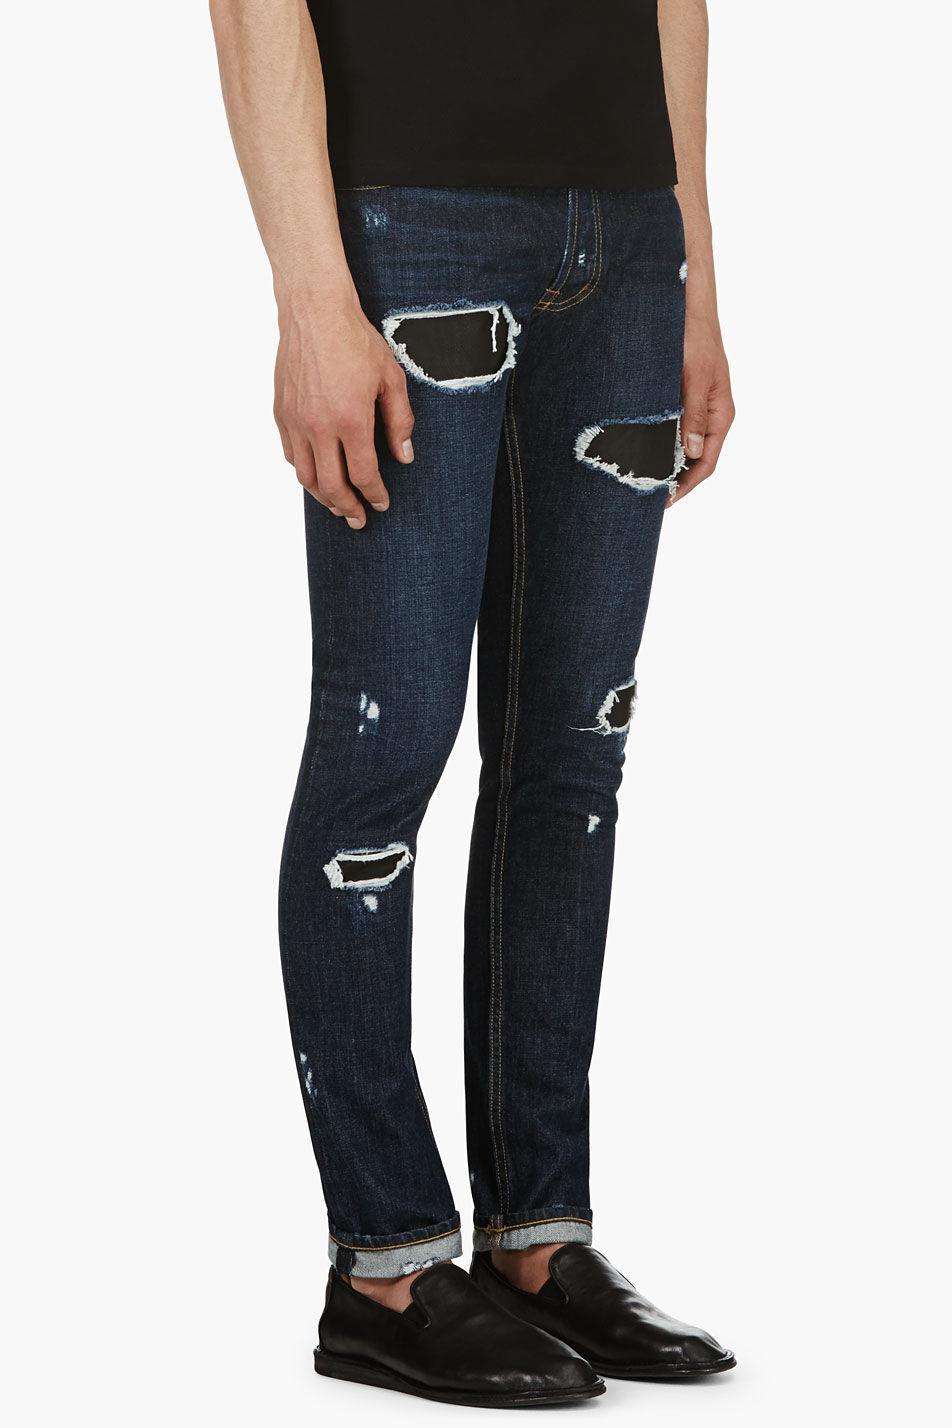 NWT  Public School bluee Indigo Distressed Leather Patch Skinny [Size 31] A87